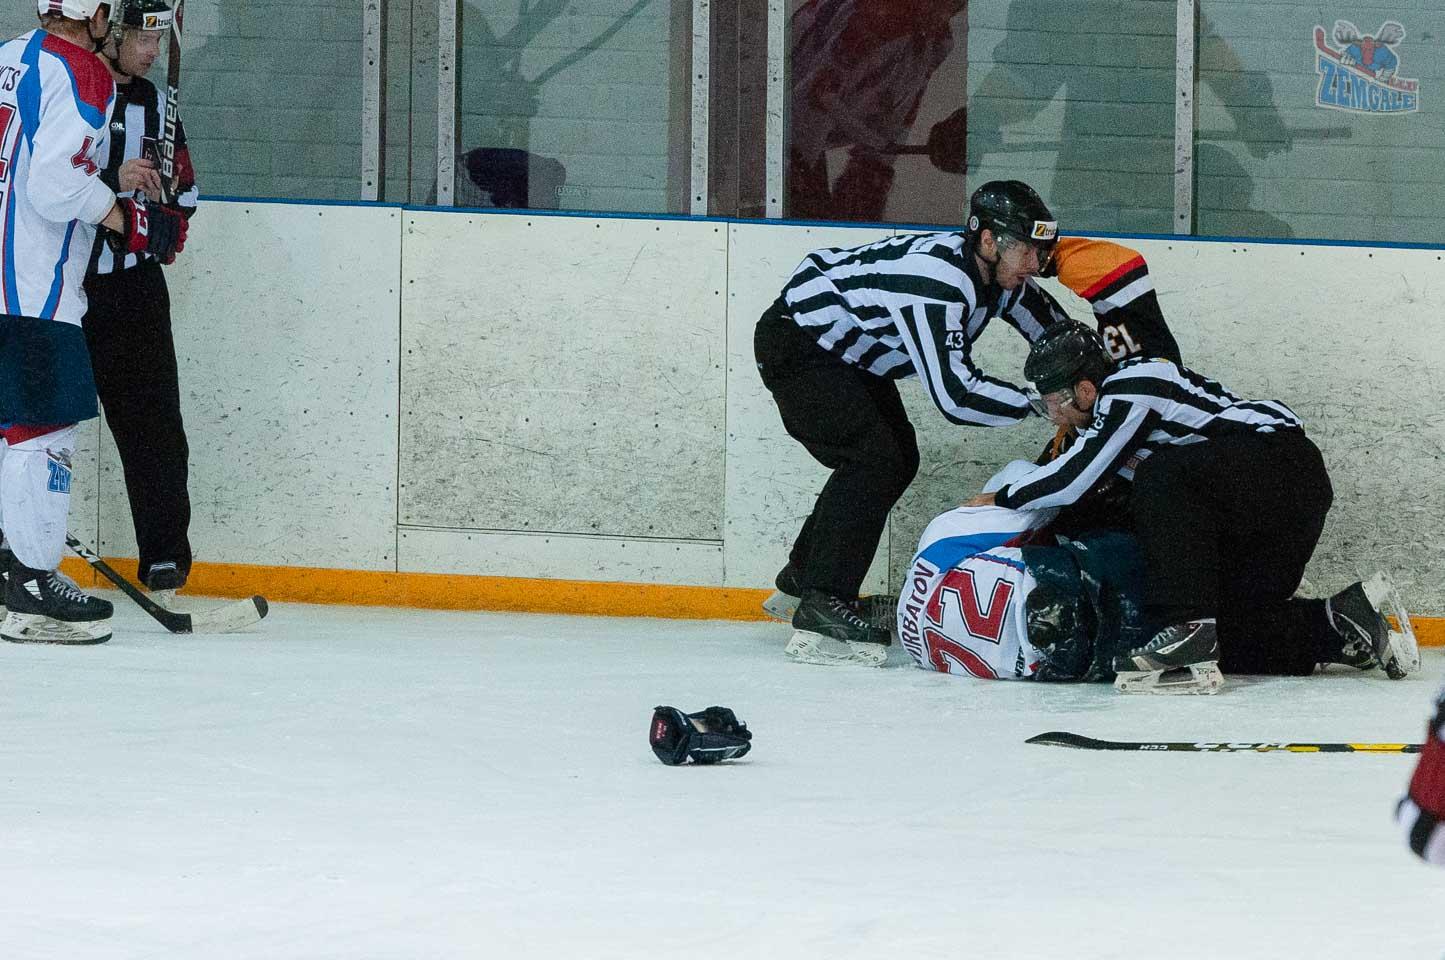 Tiesneši izšķir kaujošos hokejistus